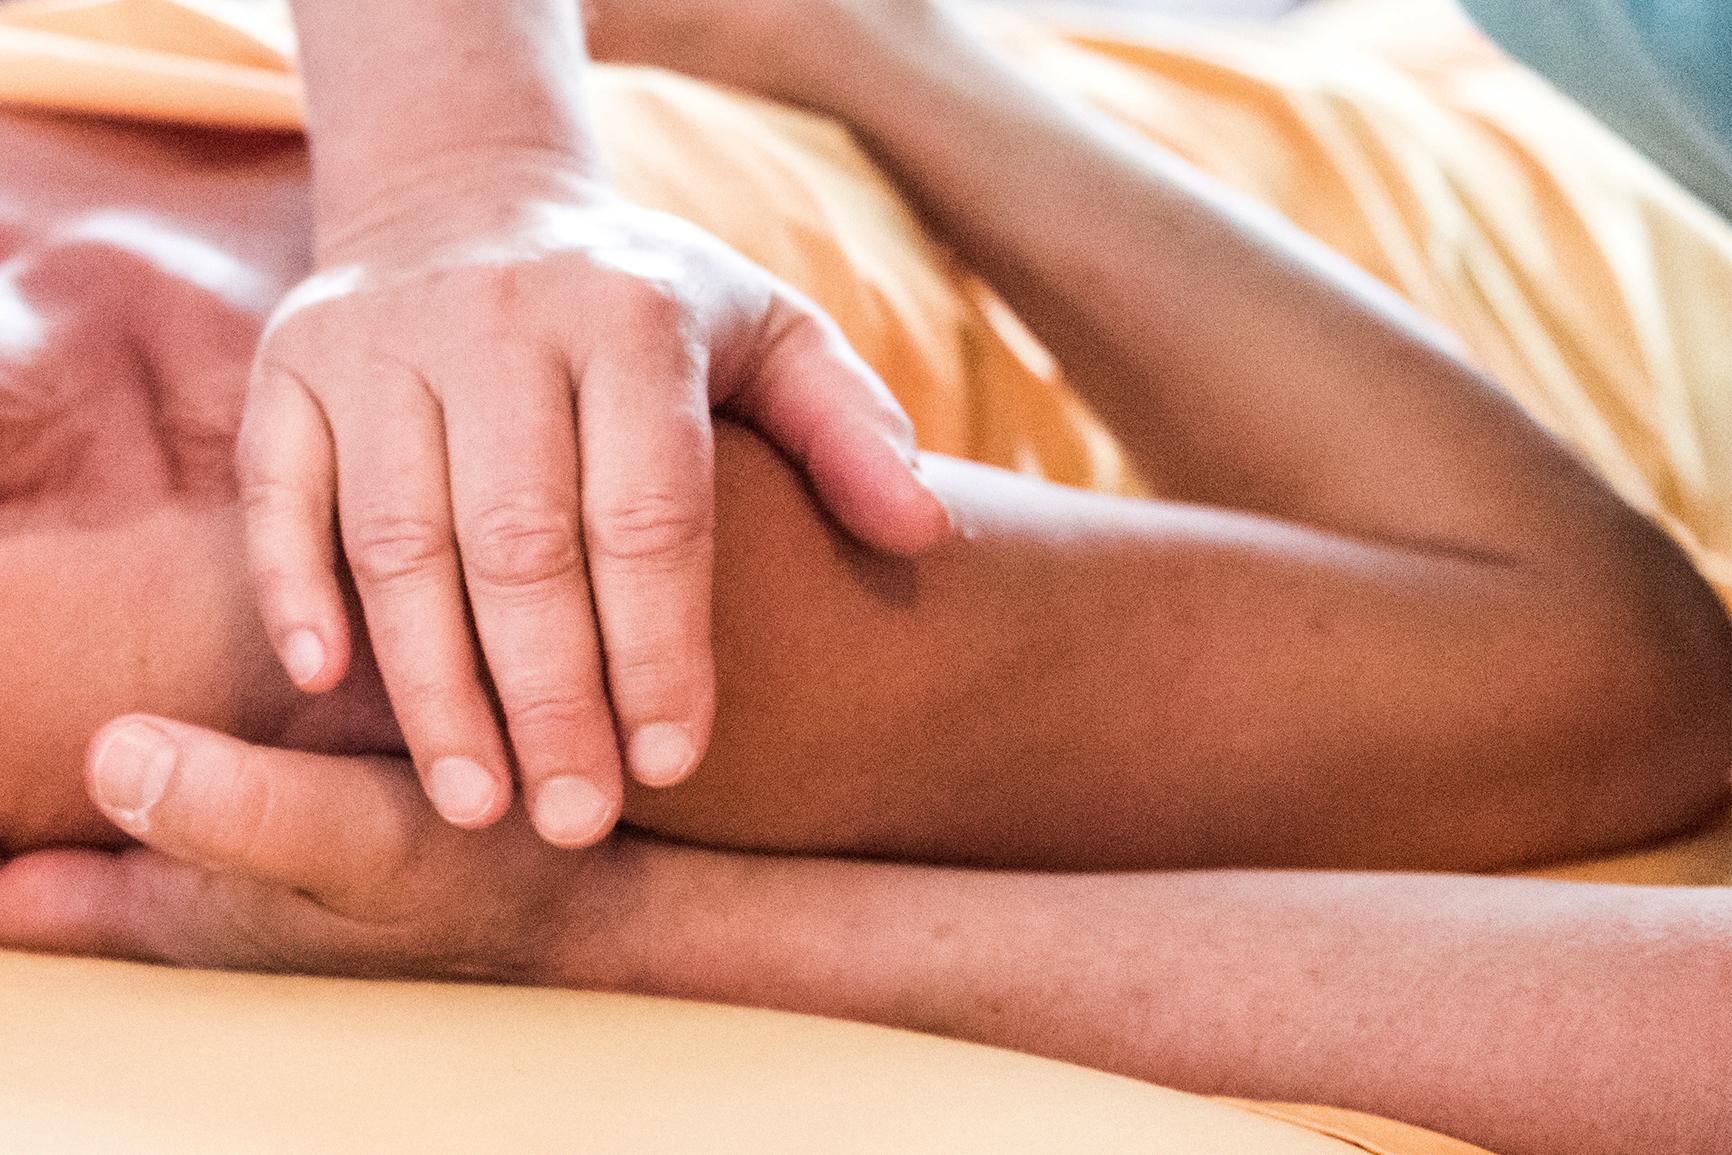 Somatic Healing Arts Massage in Zürich - Rolfing